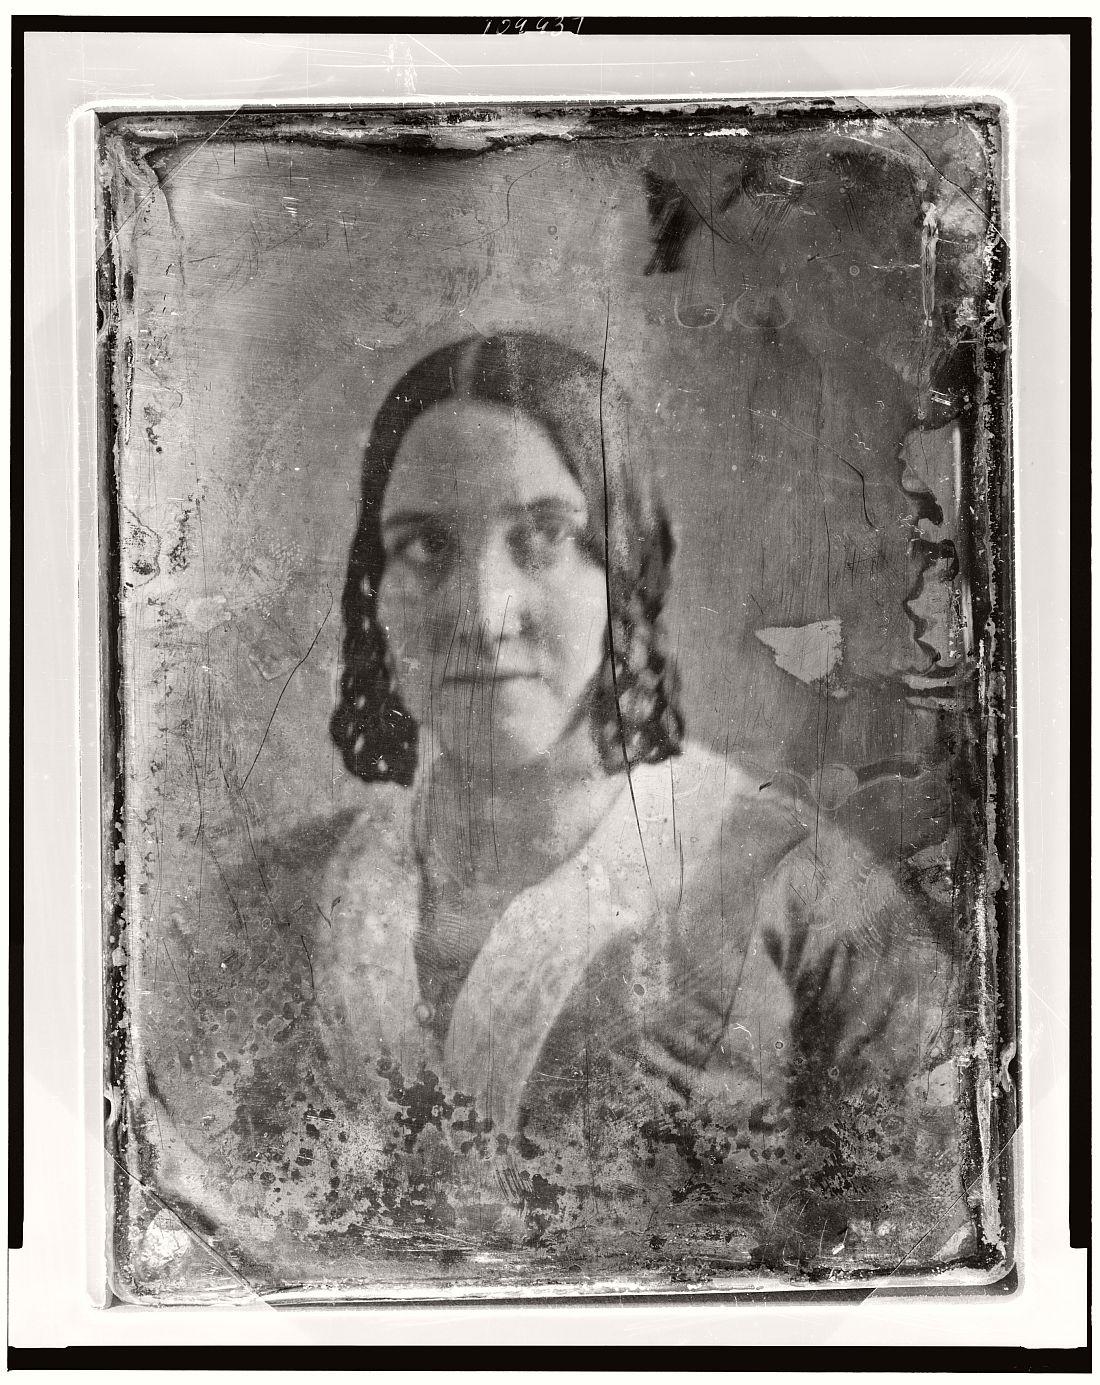 vintage-daguerreotype-portraits-from-xix-century-1844-1860-28